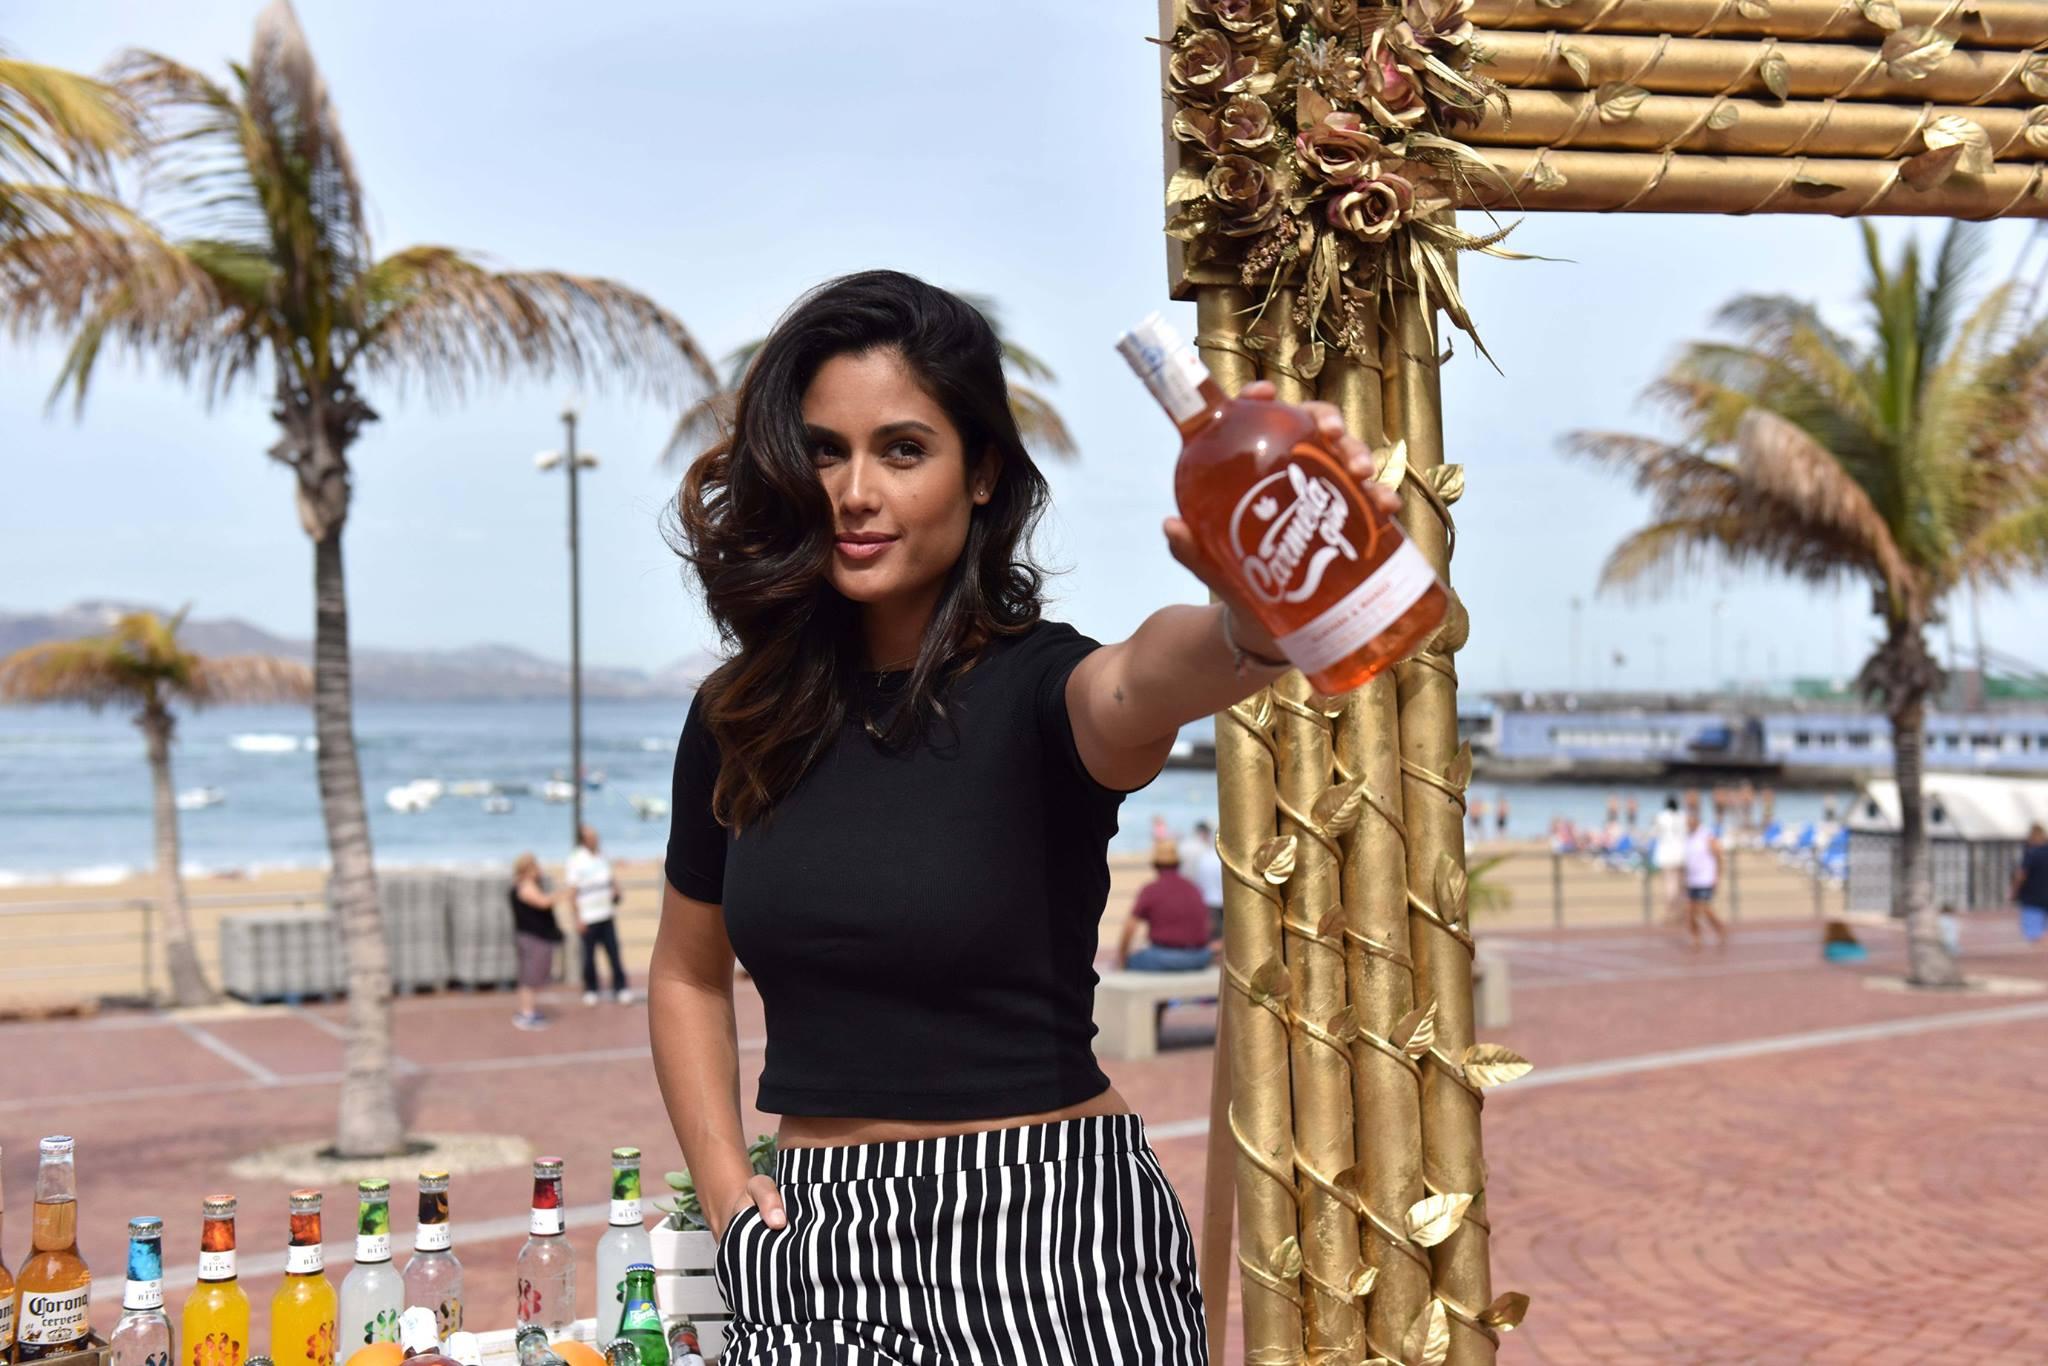 Carmela Gin patrocina el FashionShow +QModa Canarias Tribute